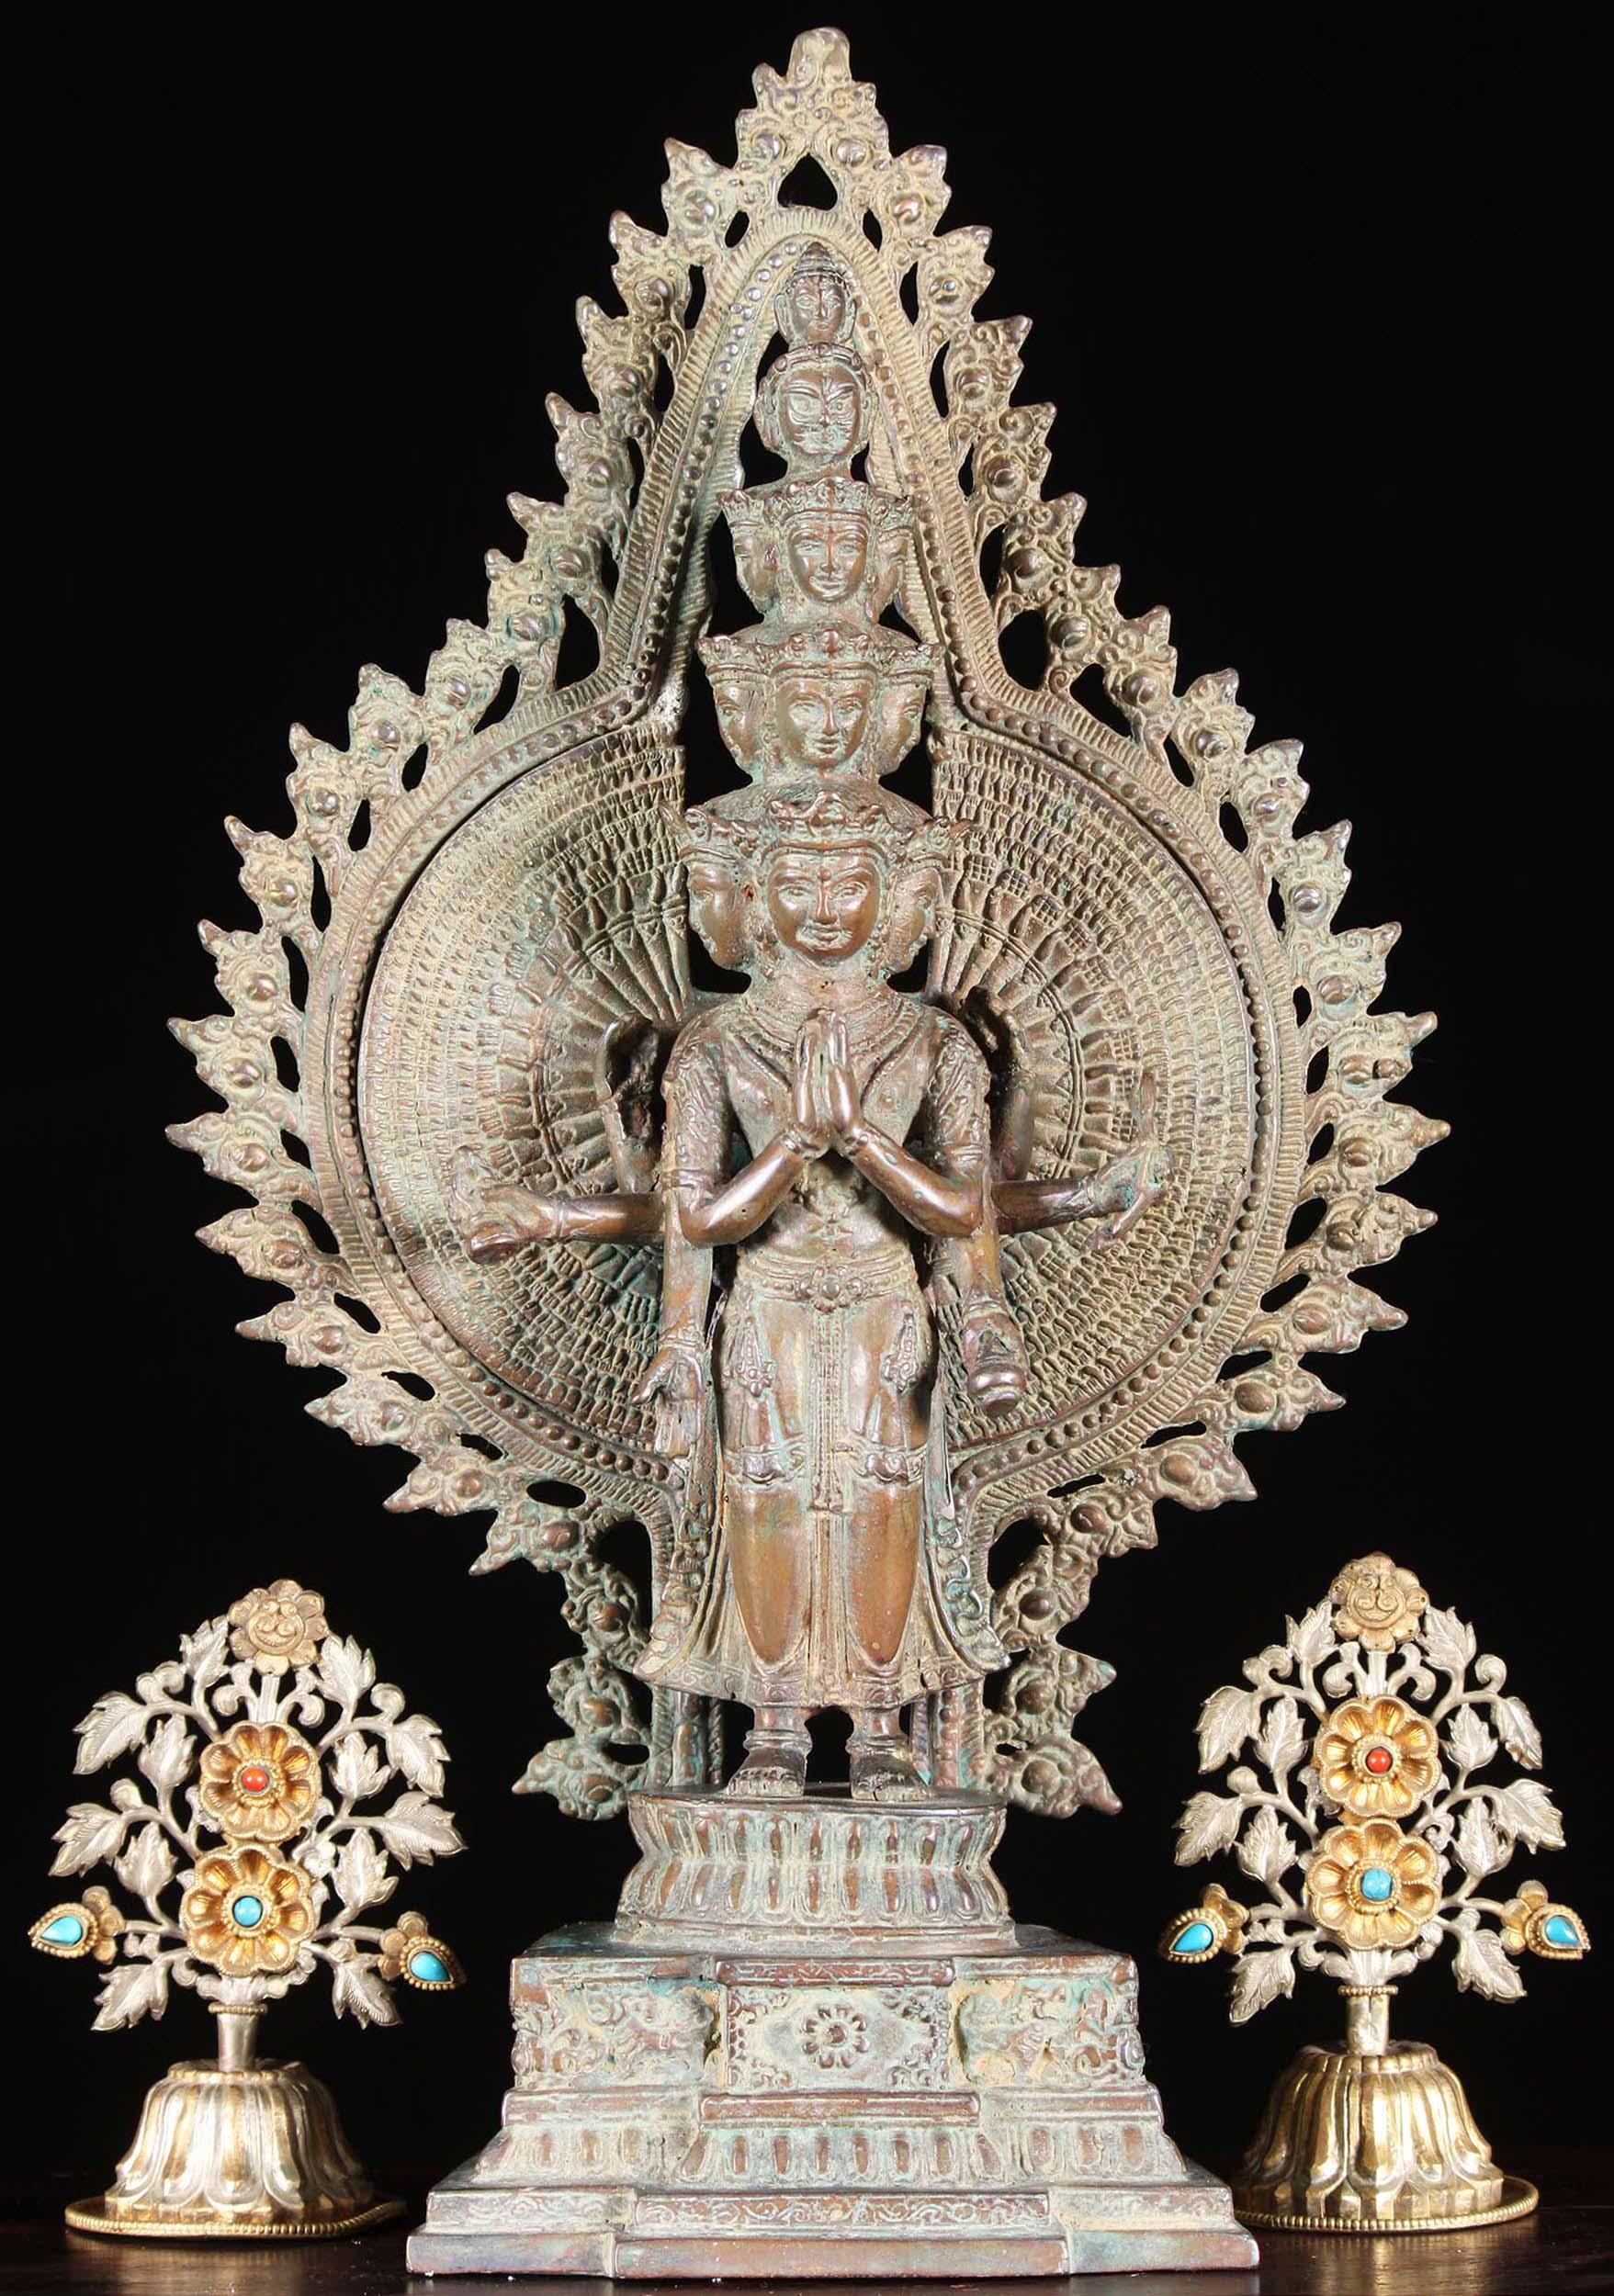 Pity, avalokiteshvara buddha statue casually found